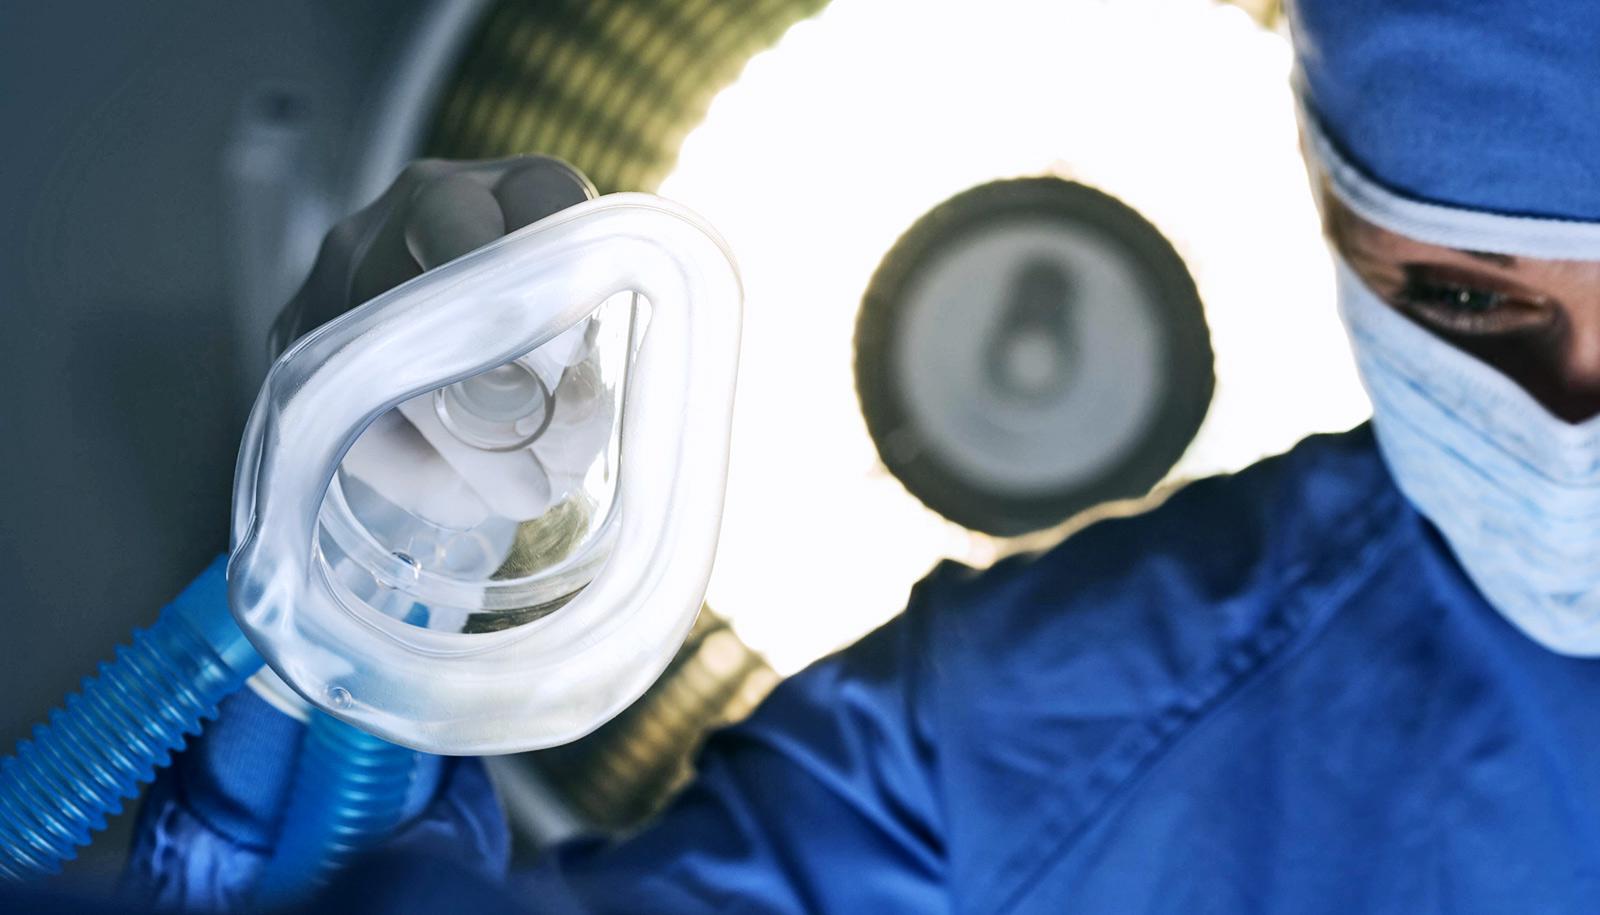 surgeon holding anesthesia mask